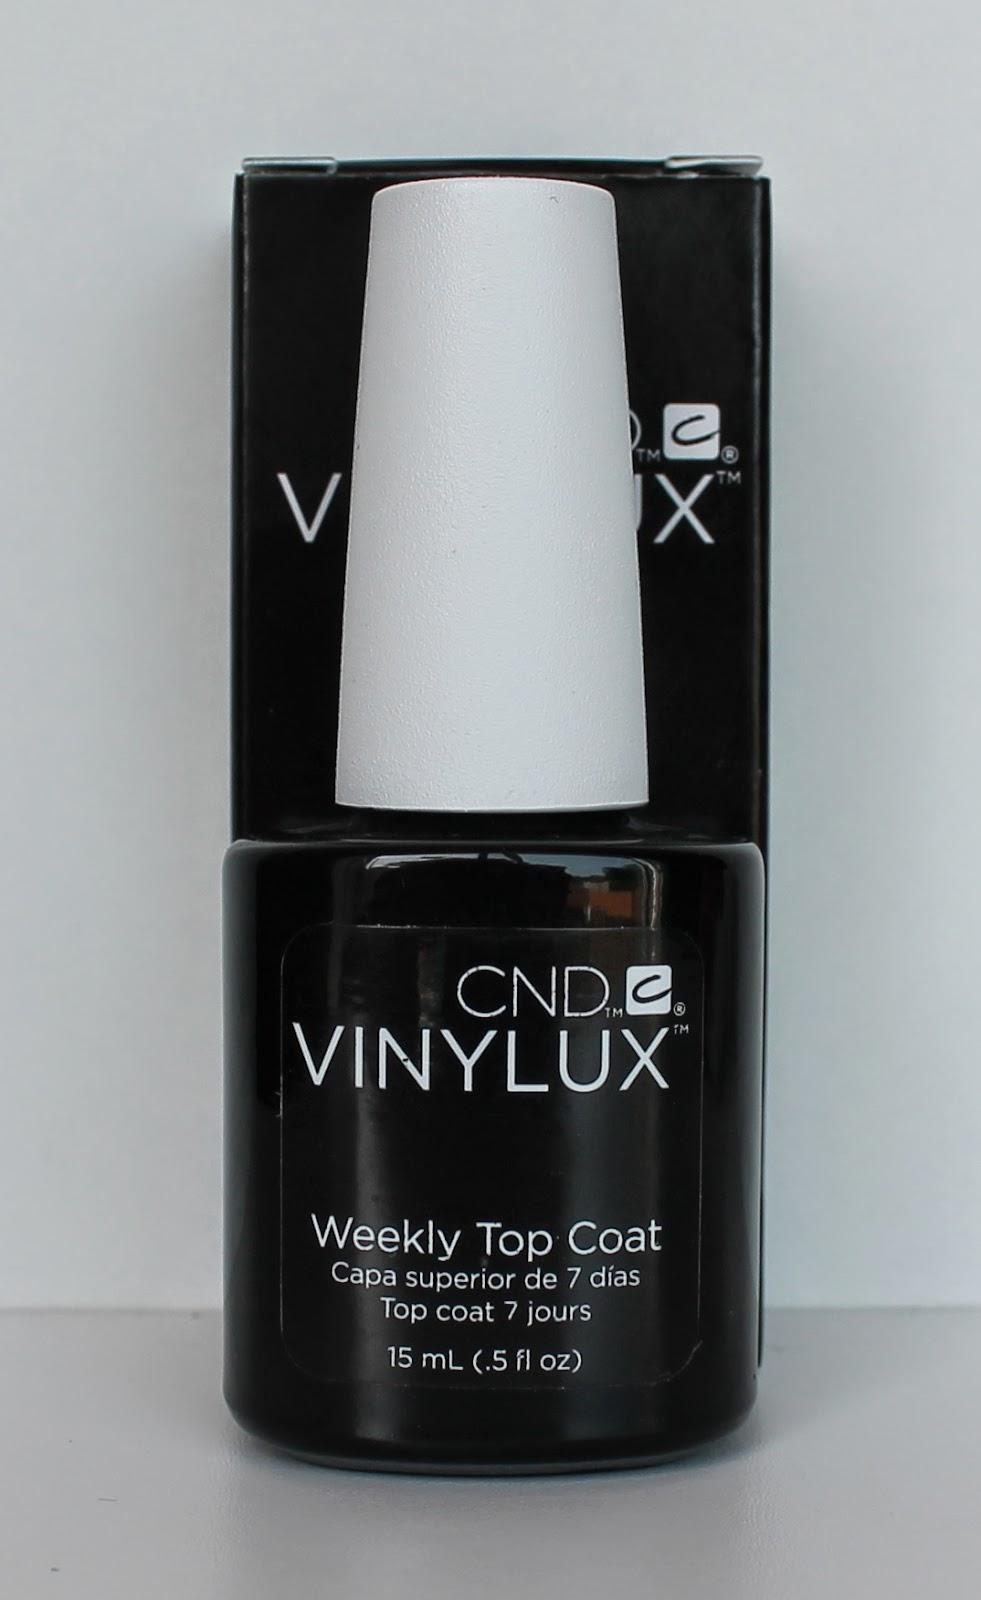 CND Vinylux Topcoat